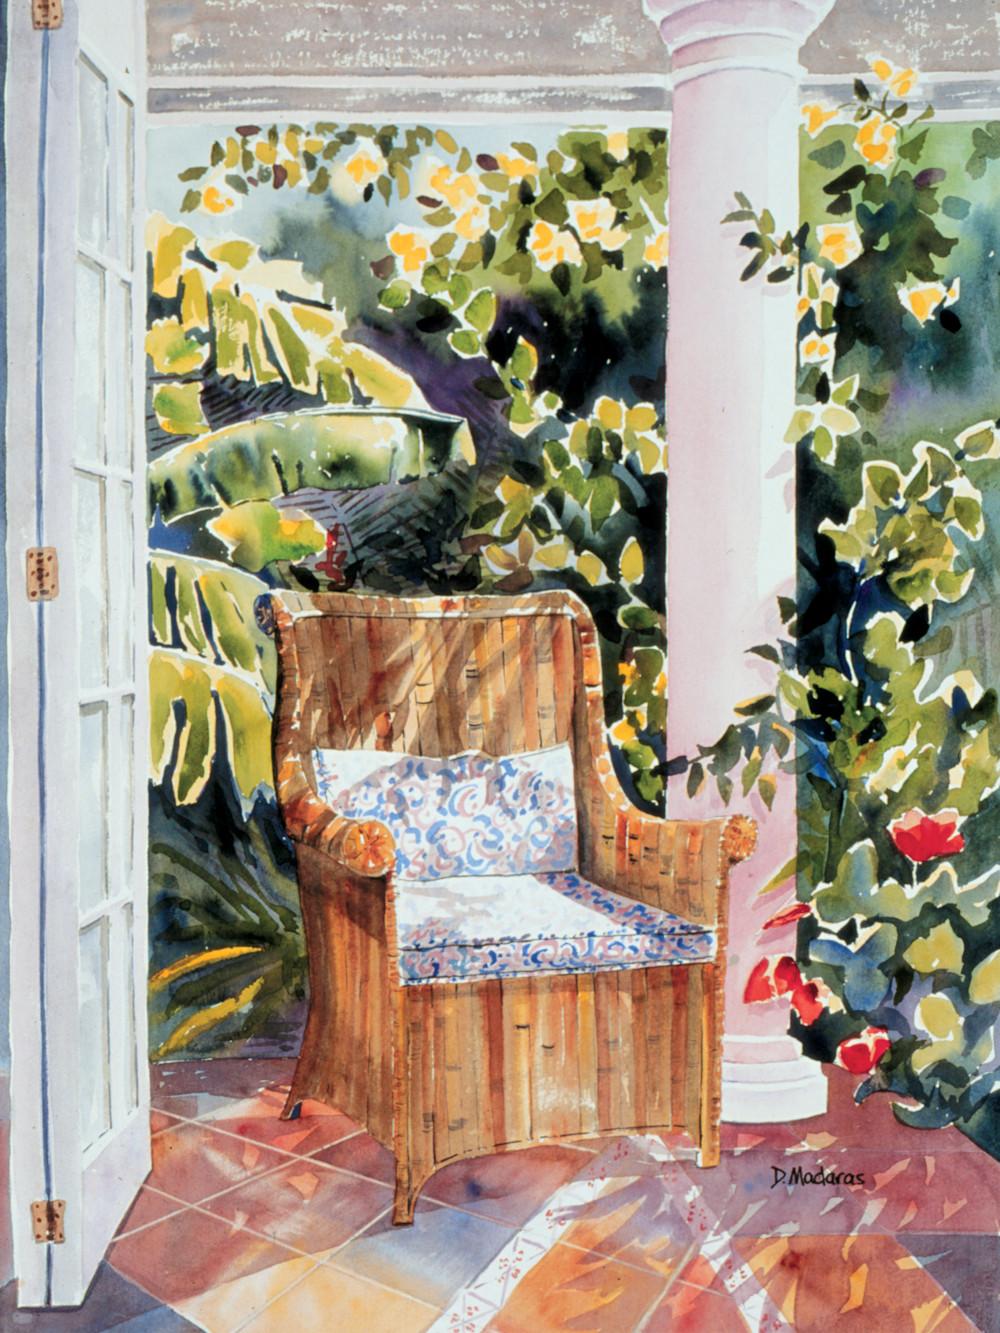 Southwest Art | Madaras Calendar | Morning In Paradise | Tucson Art Gallery